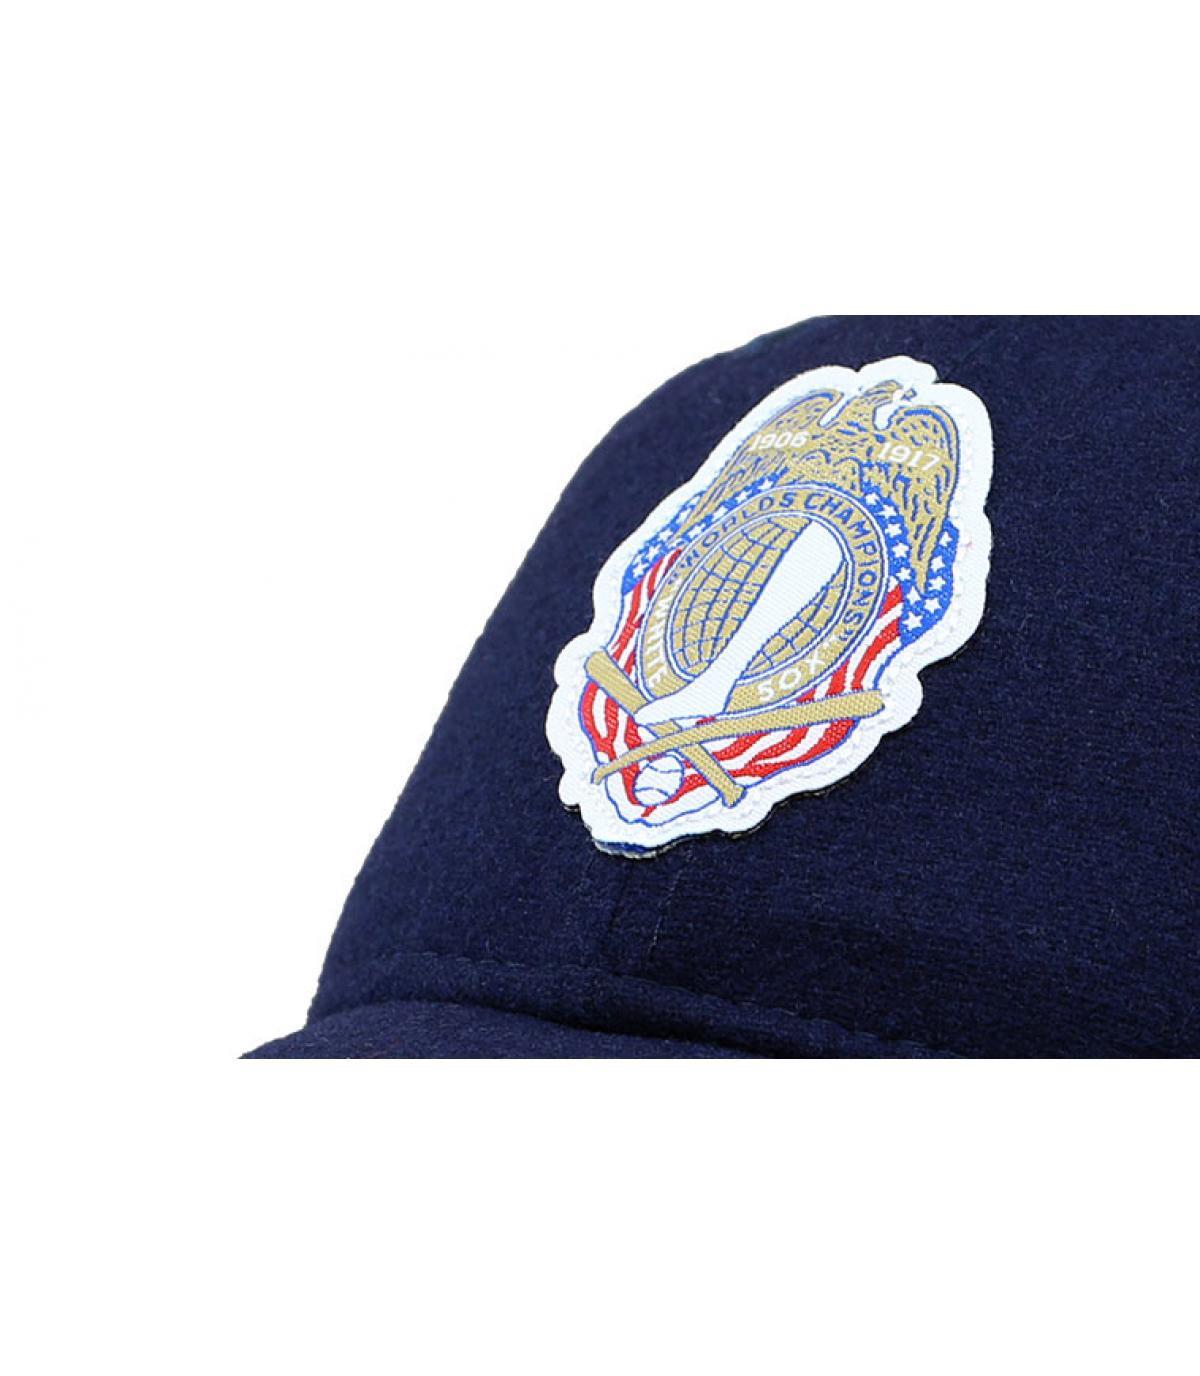 Details Sox Coops 920 navy - afbeeling 3